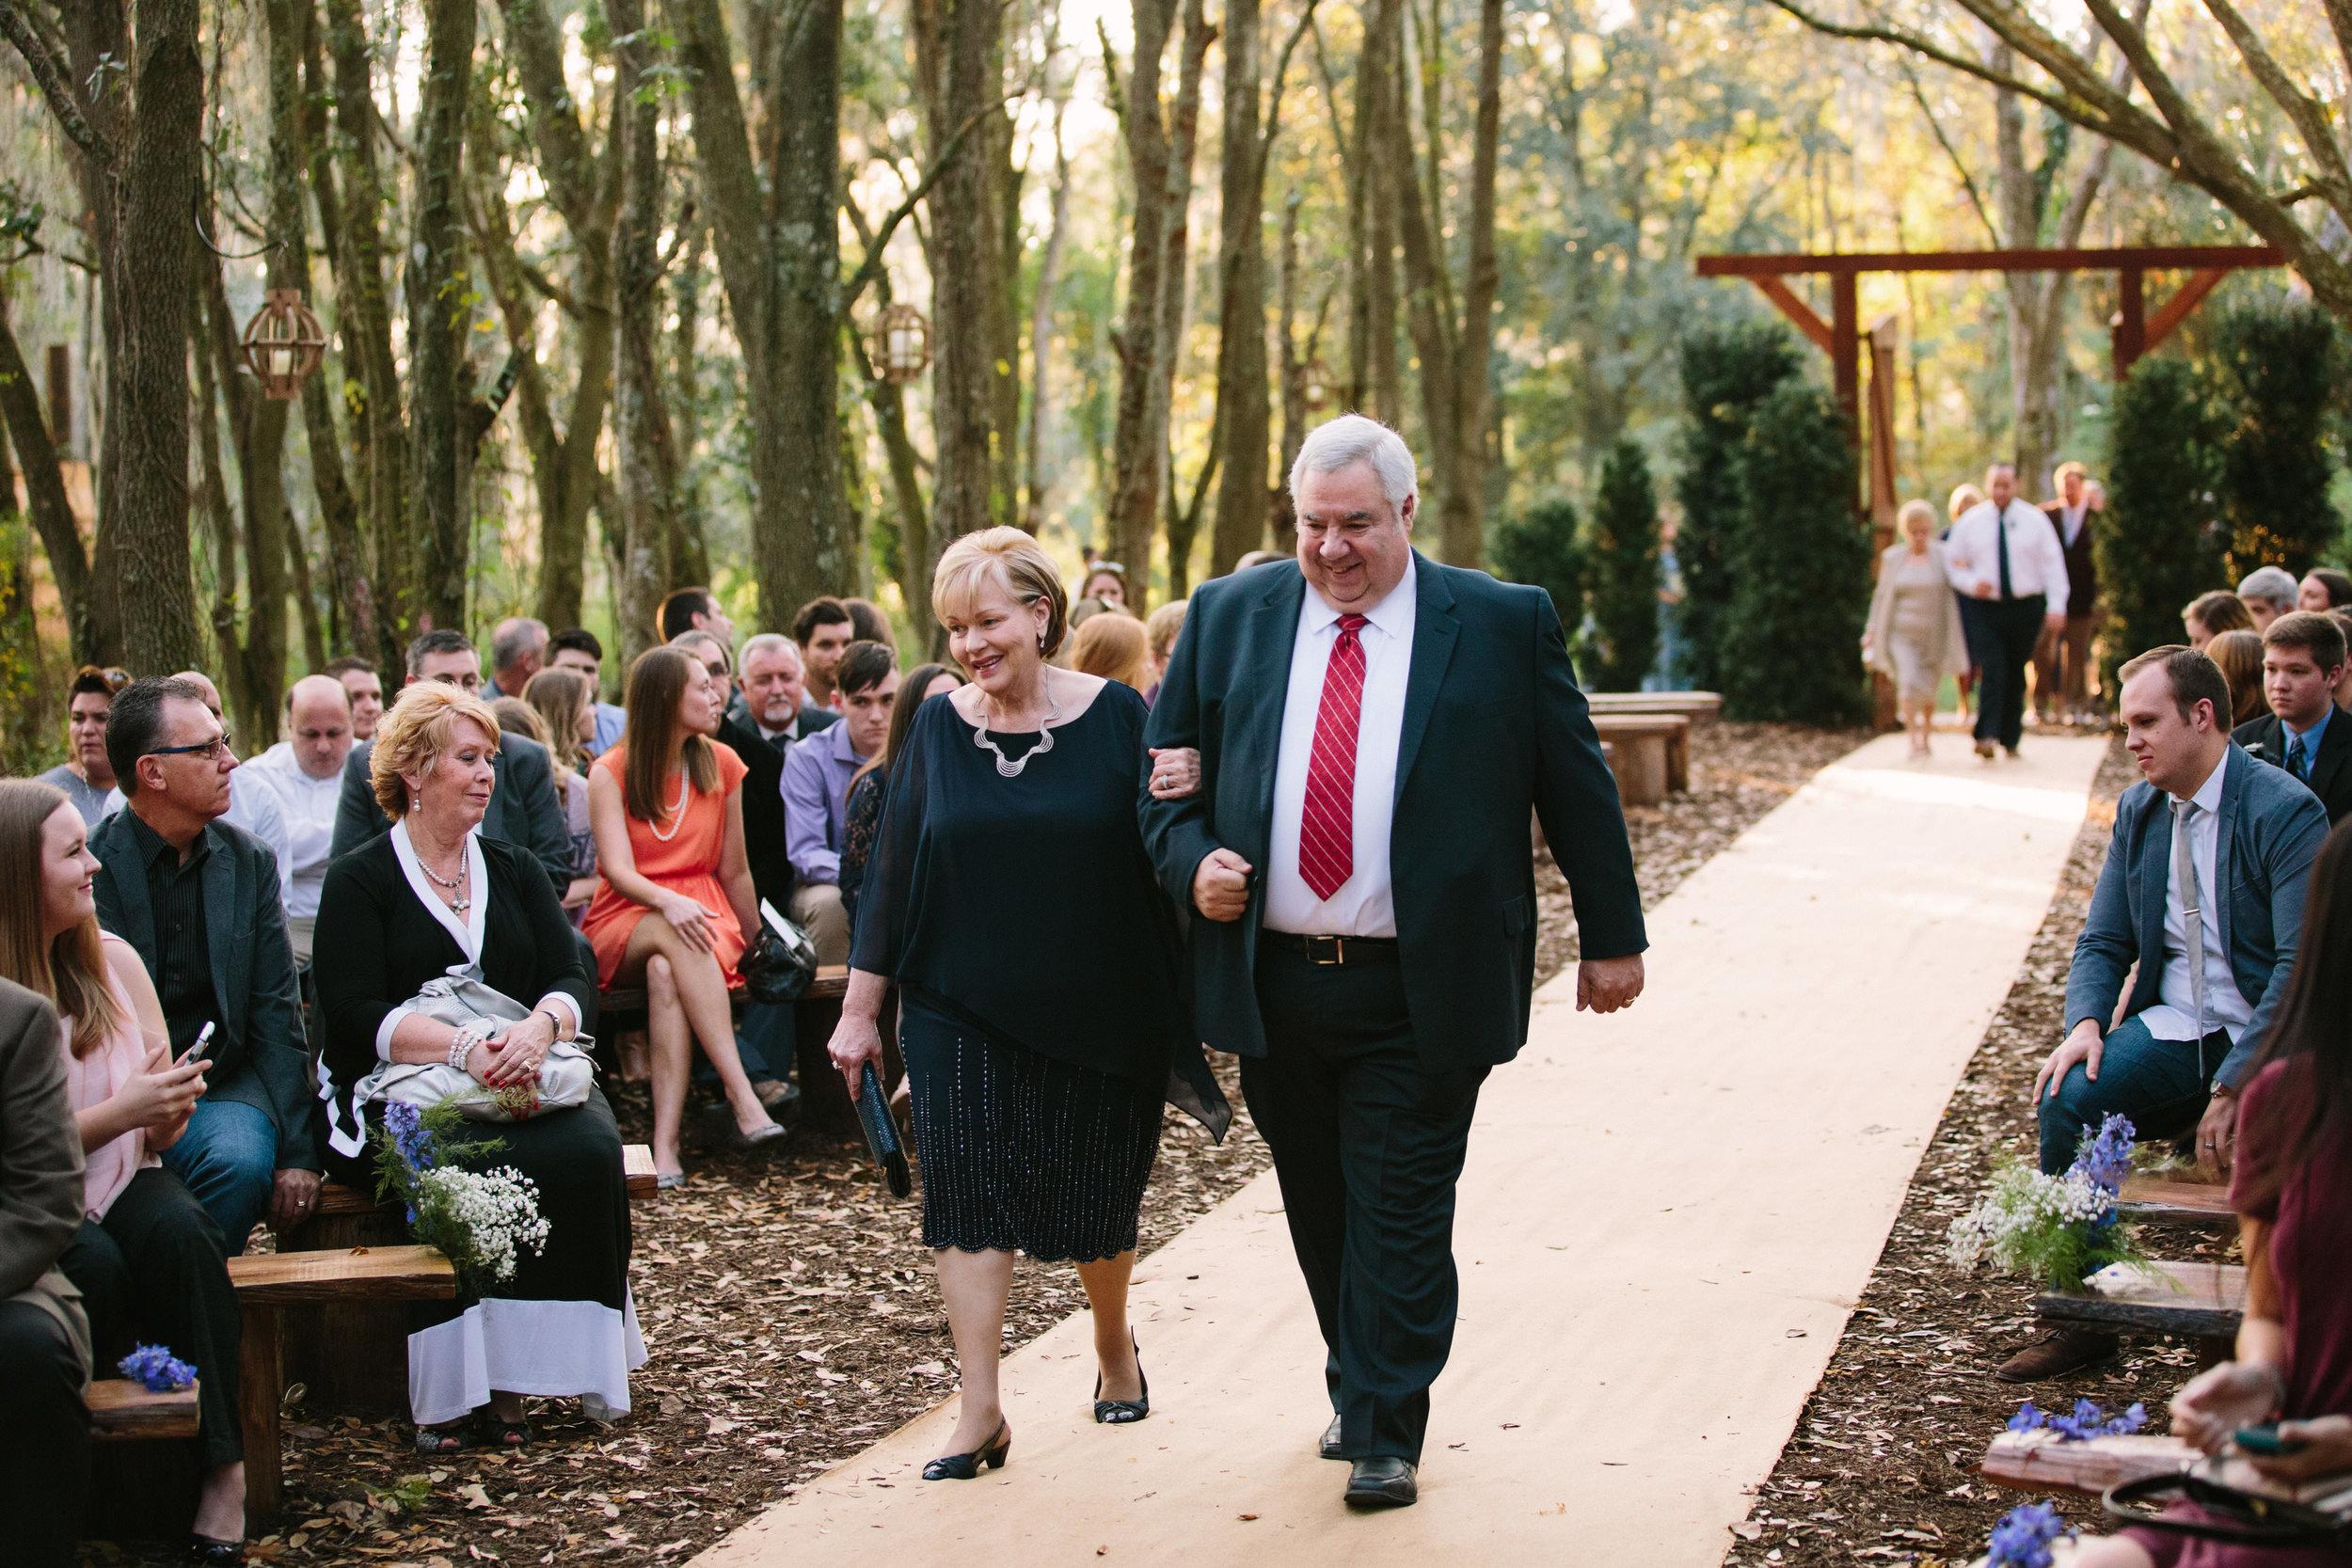 Gables Ceremony   Florida Rustic Barn Weddings   Plant City, Florida Wedding Photography   Benjamin Hewitt Photographer